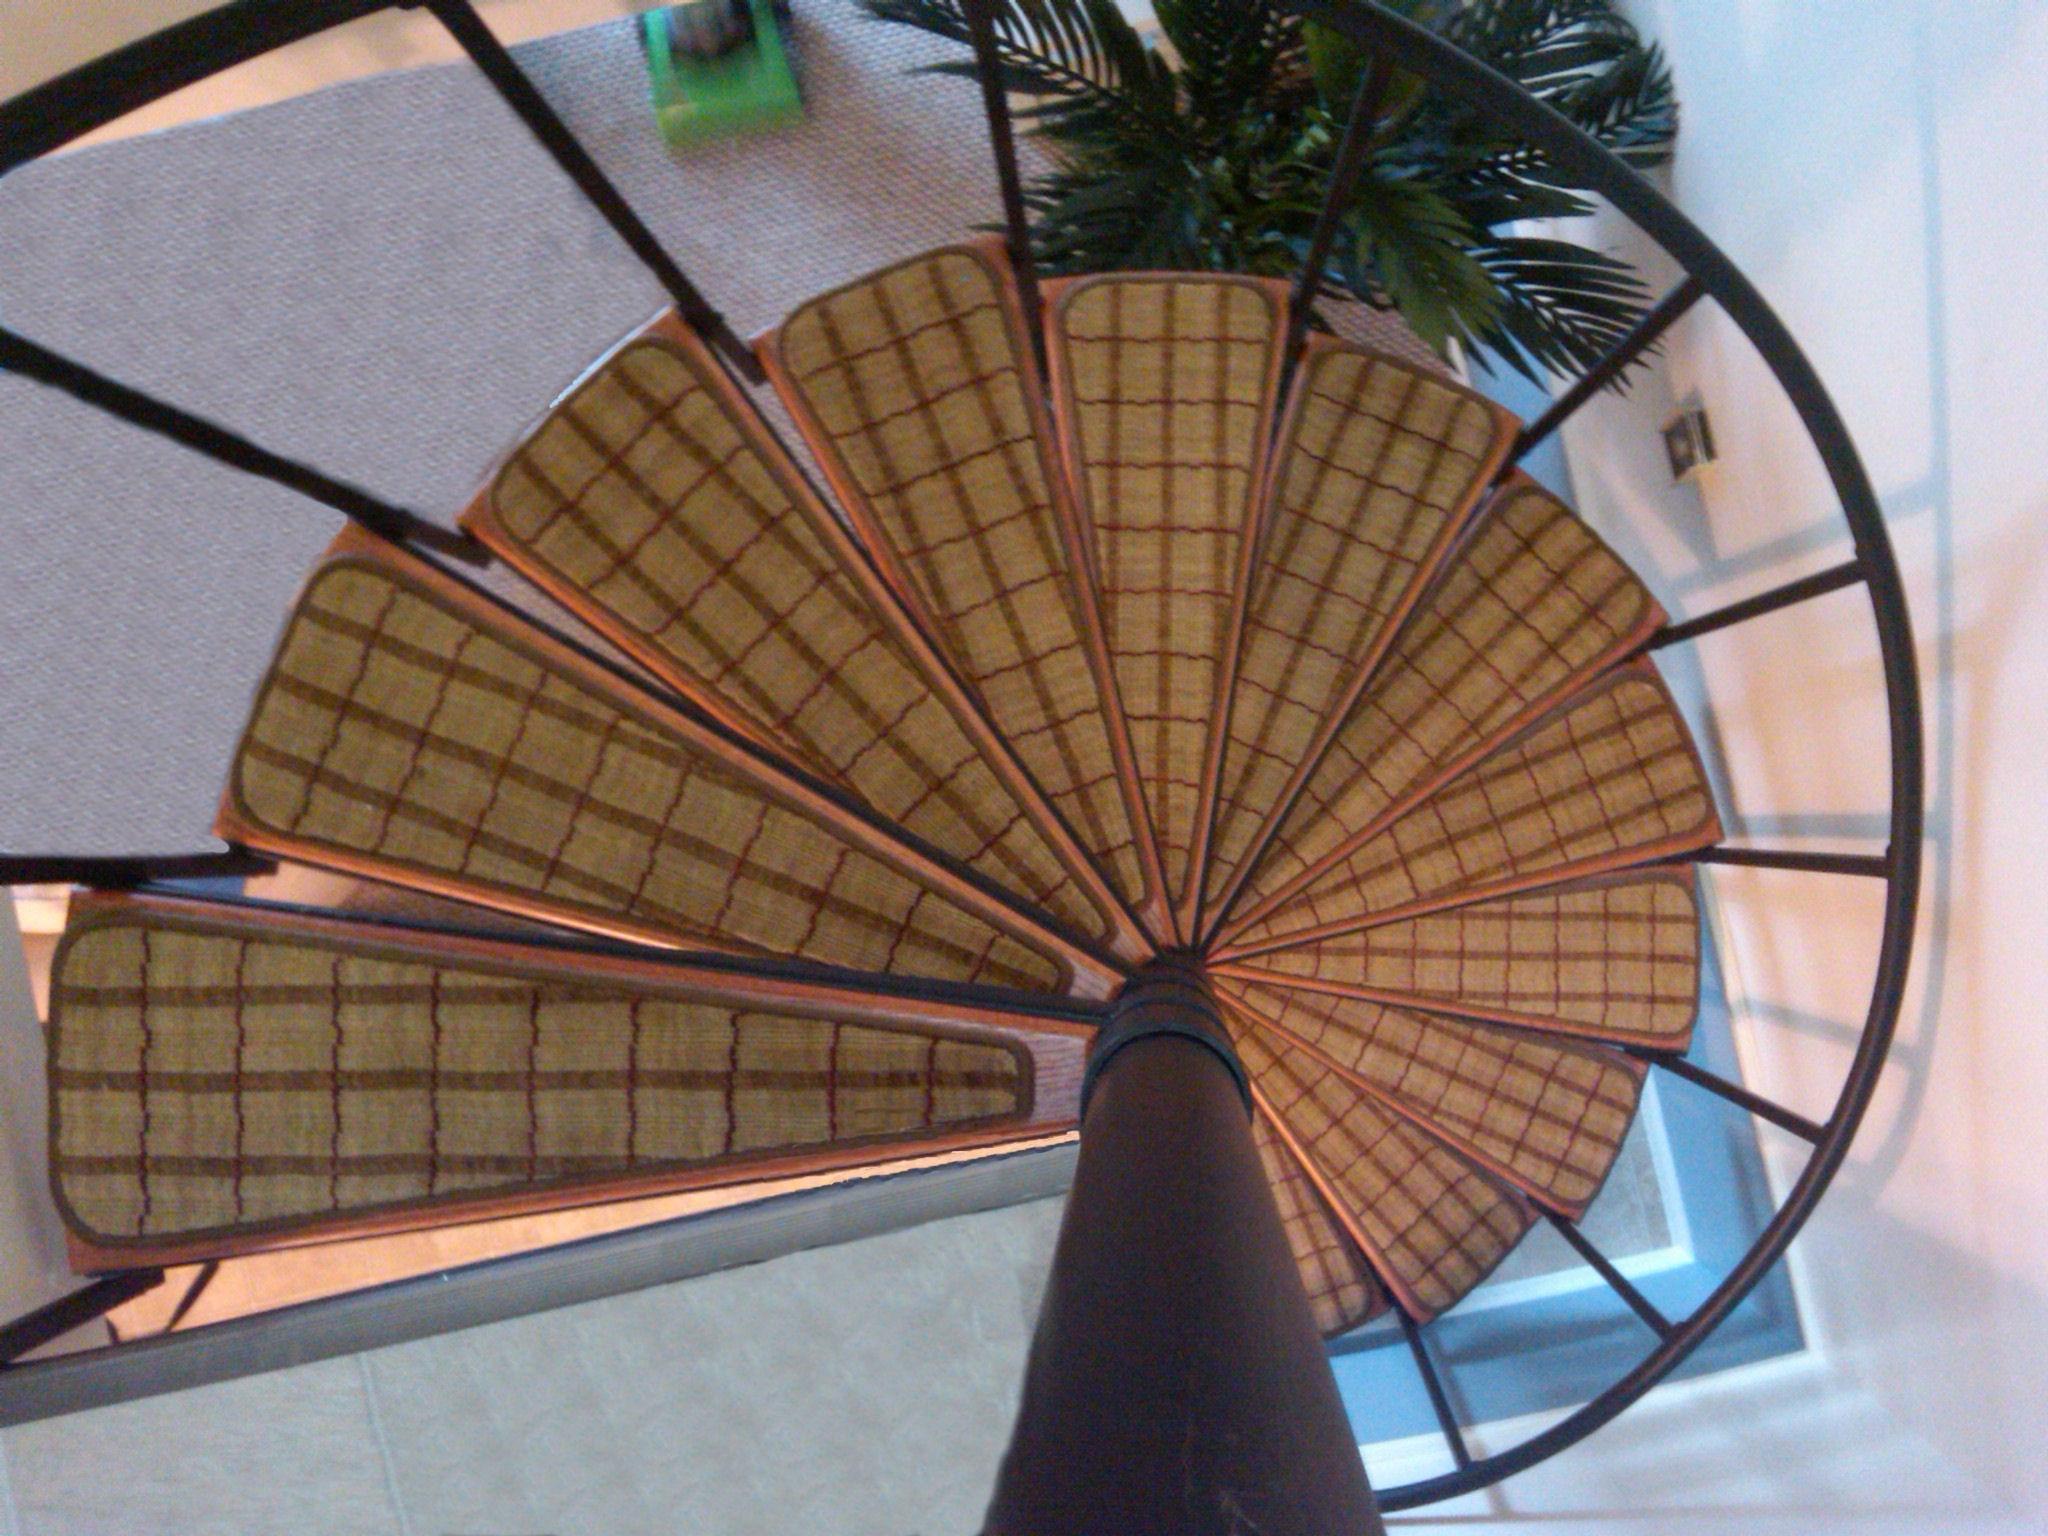 Rug Carpet Stair Treads Lowes Stair Tread Rugs Outdoor Stair With Regard To Stair Tread Rugs Outdoor (#14 of 20)